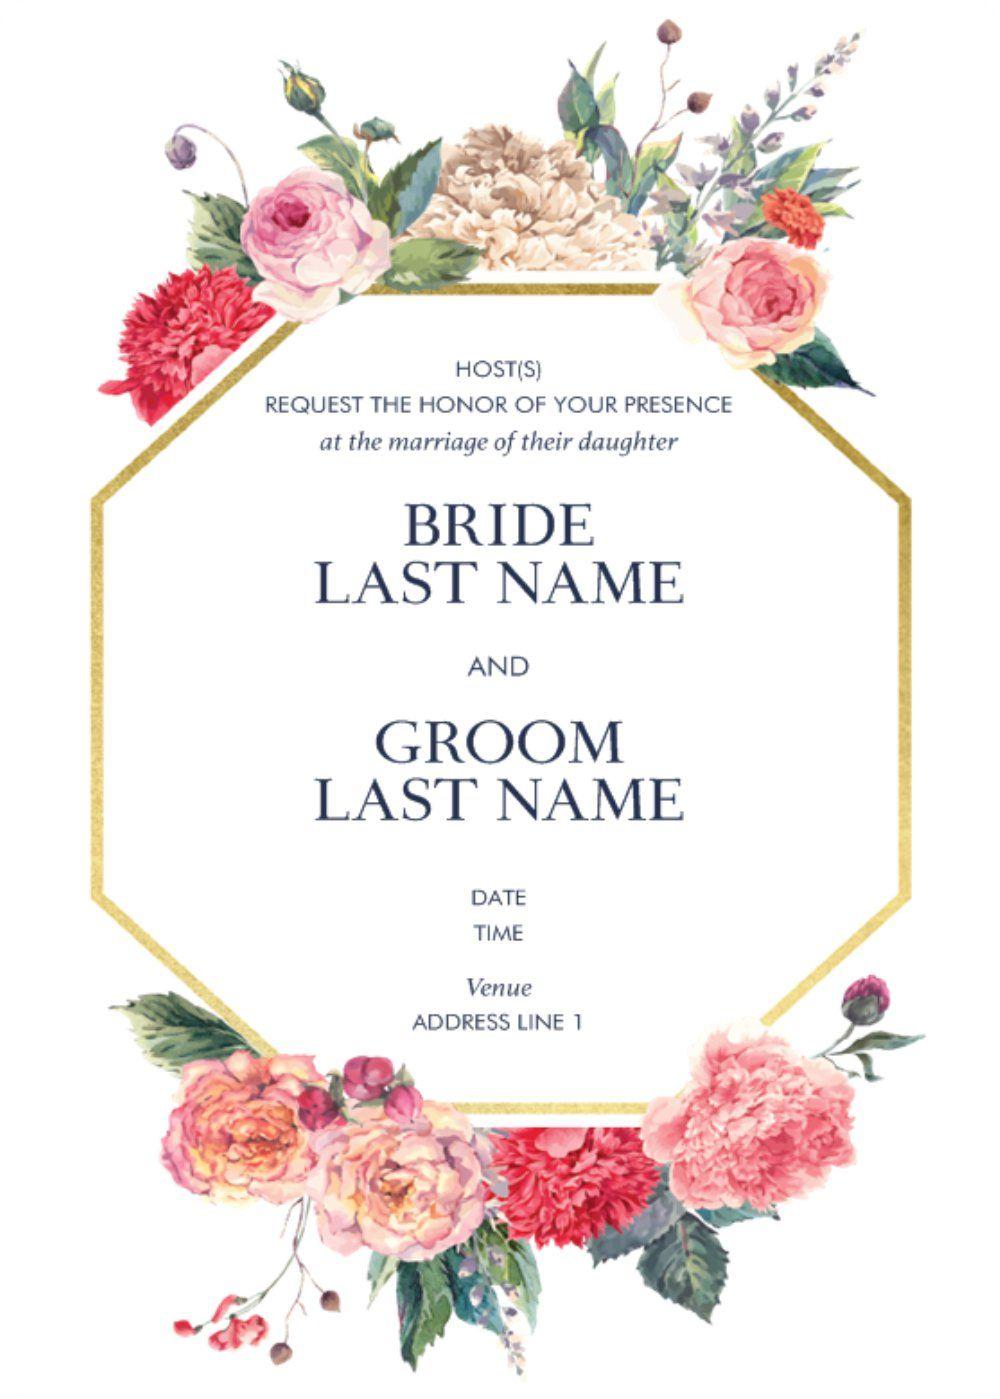 Rounded Corner Invitations Affordable Wedding Invitations Floral Wedding Invitations Wedding Invitations